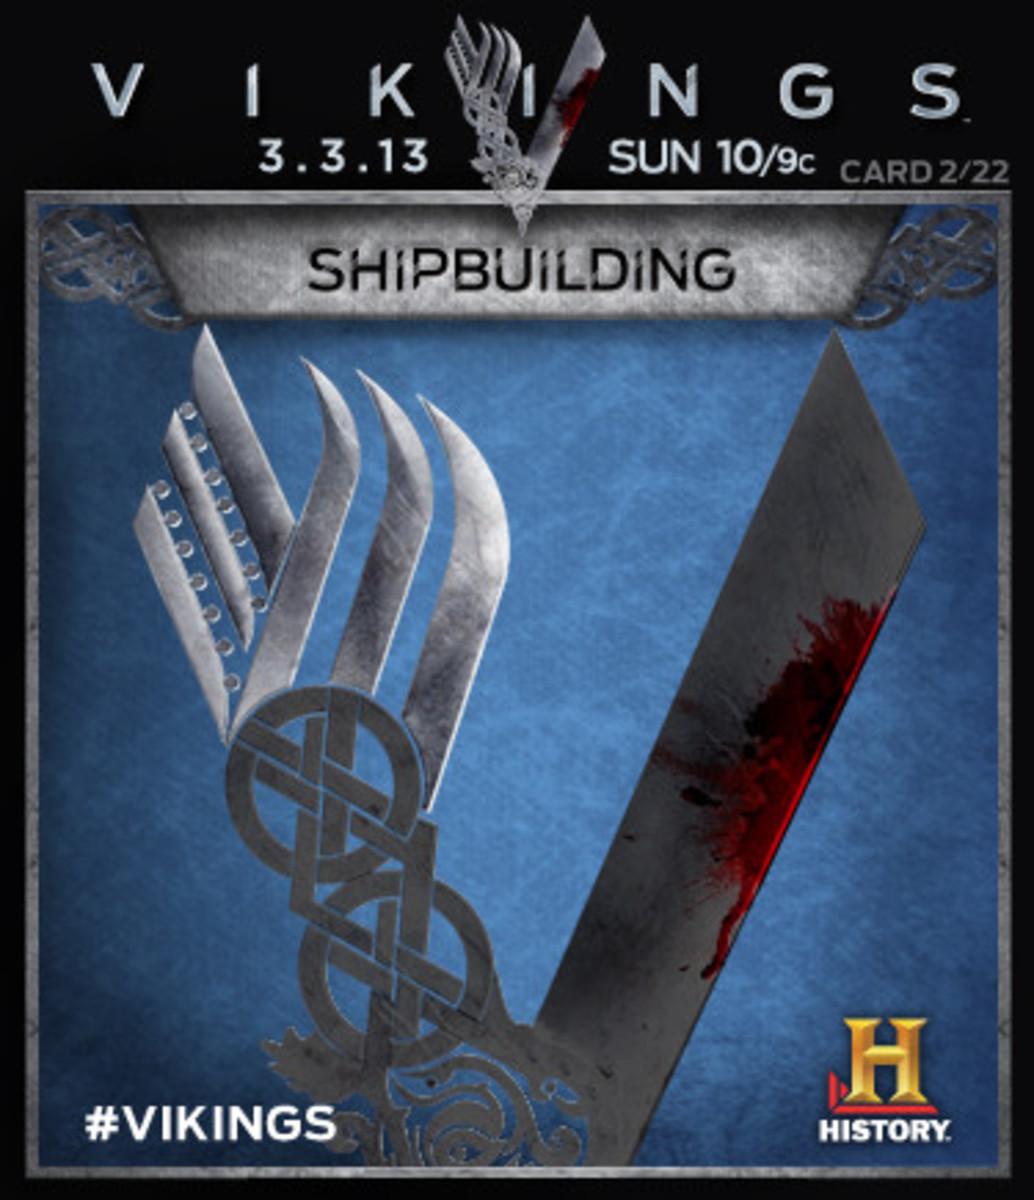 Ship Building design symbol